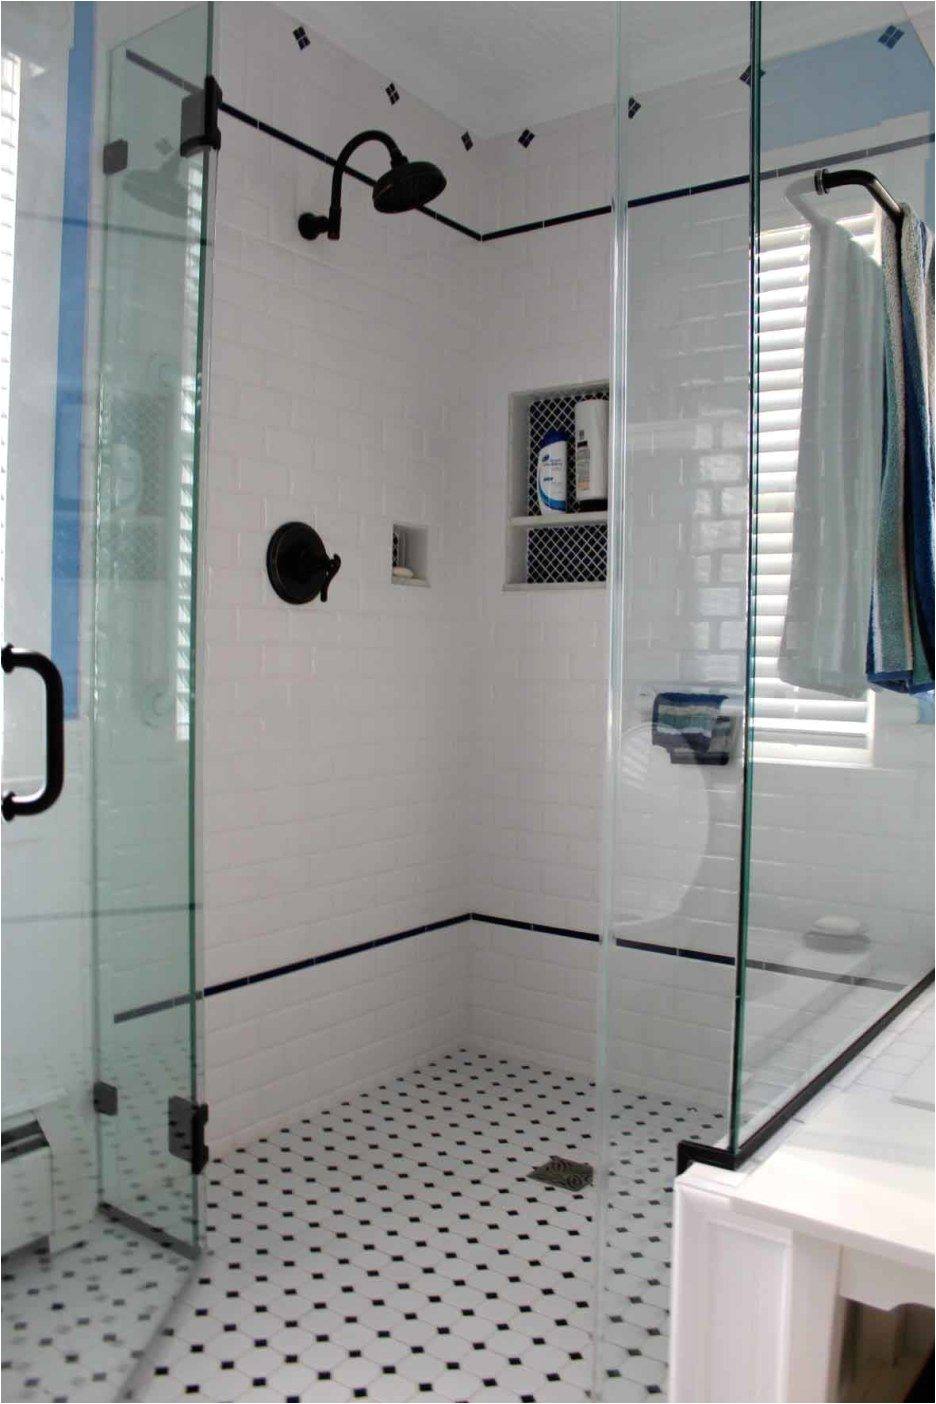 Bathroom Tiled Shower Design Ideas Bathroom White and Black Diamond Mosaic Tile Floor for Shower with